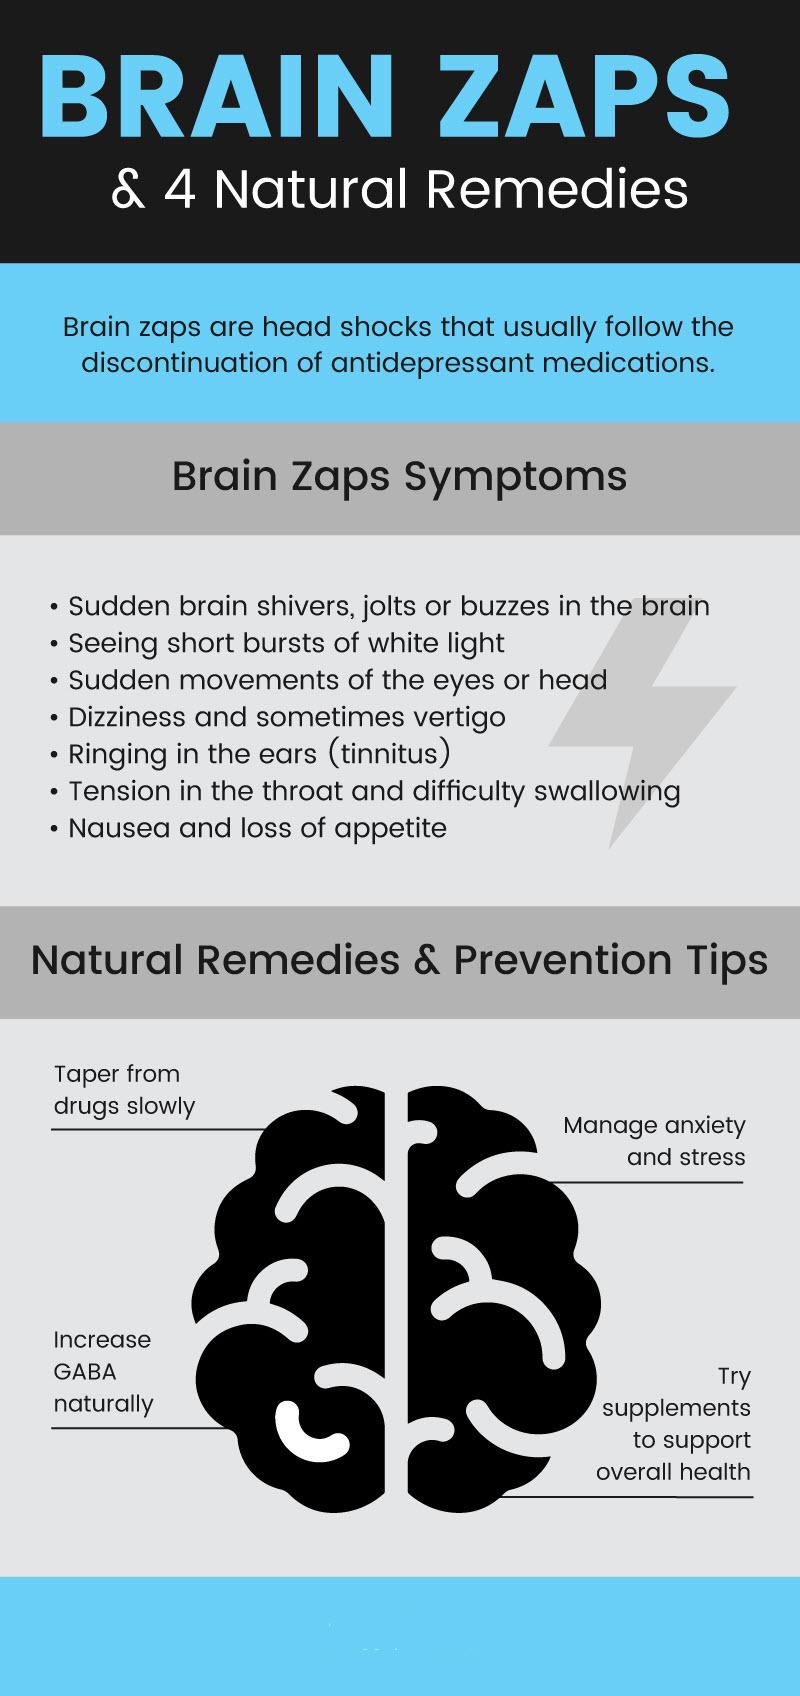 Brain zaps + 4 brain zaps natural remedies - MKexpress.net